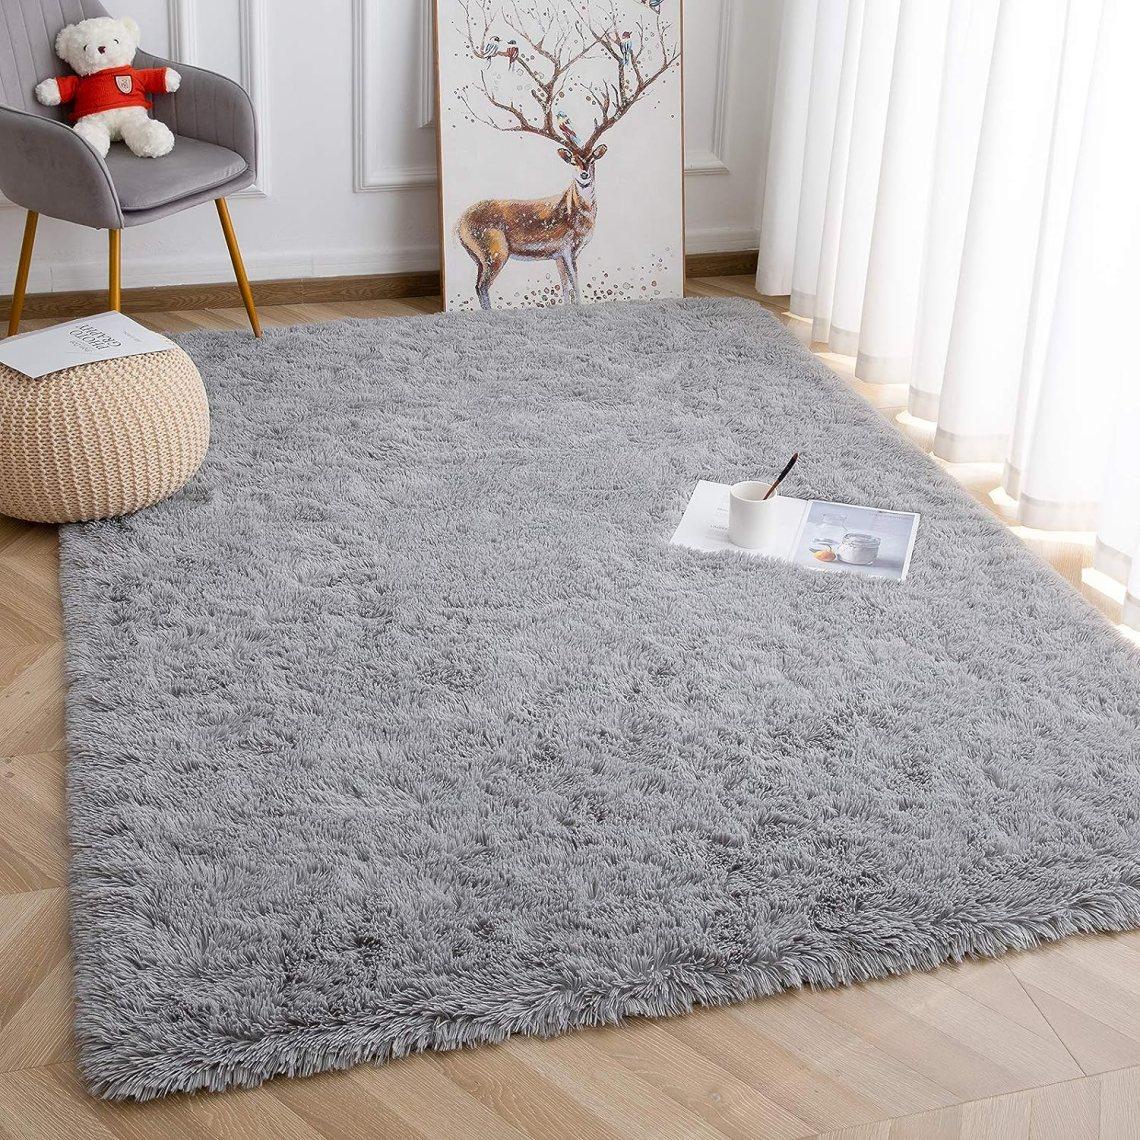 Amazon Com Vasofe Plush Area Rugs Soft Fluffy Rugs Shaggy Floor Carpet For Bedroom Livingroom Dormitory Home Decor Kids Room Nursery Rug 4 X 5 9 Grey Home Kitchen